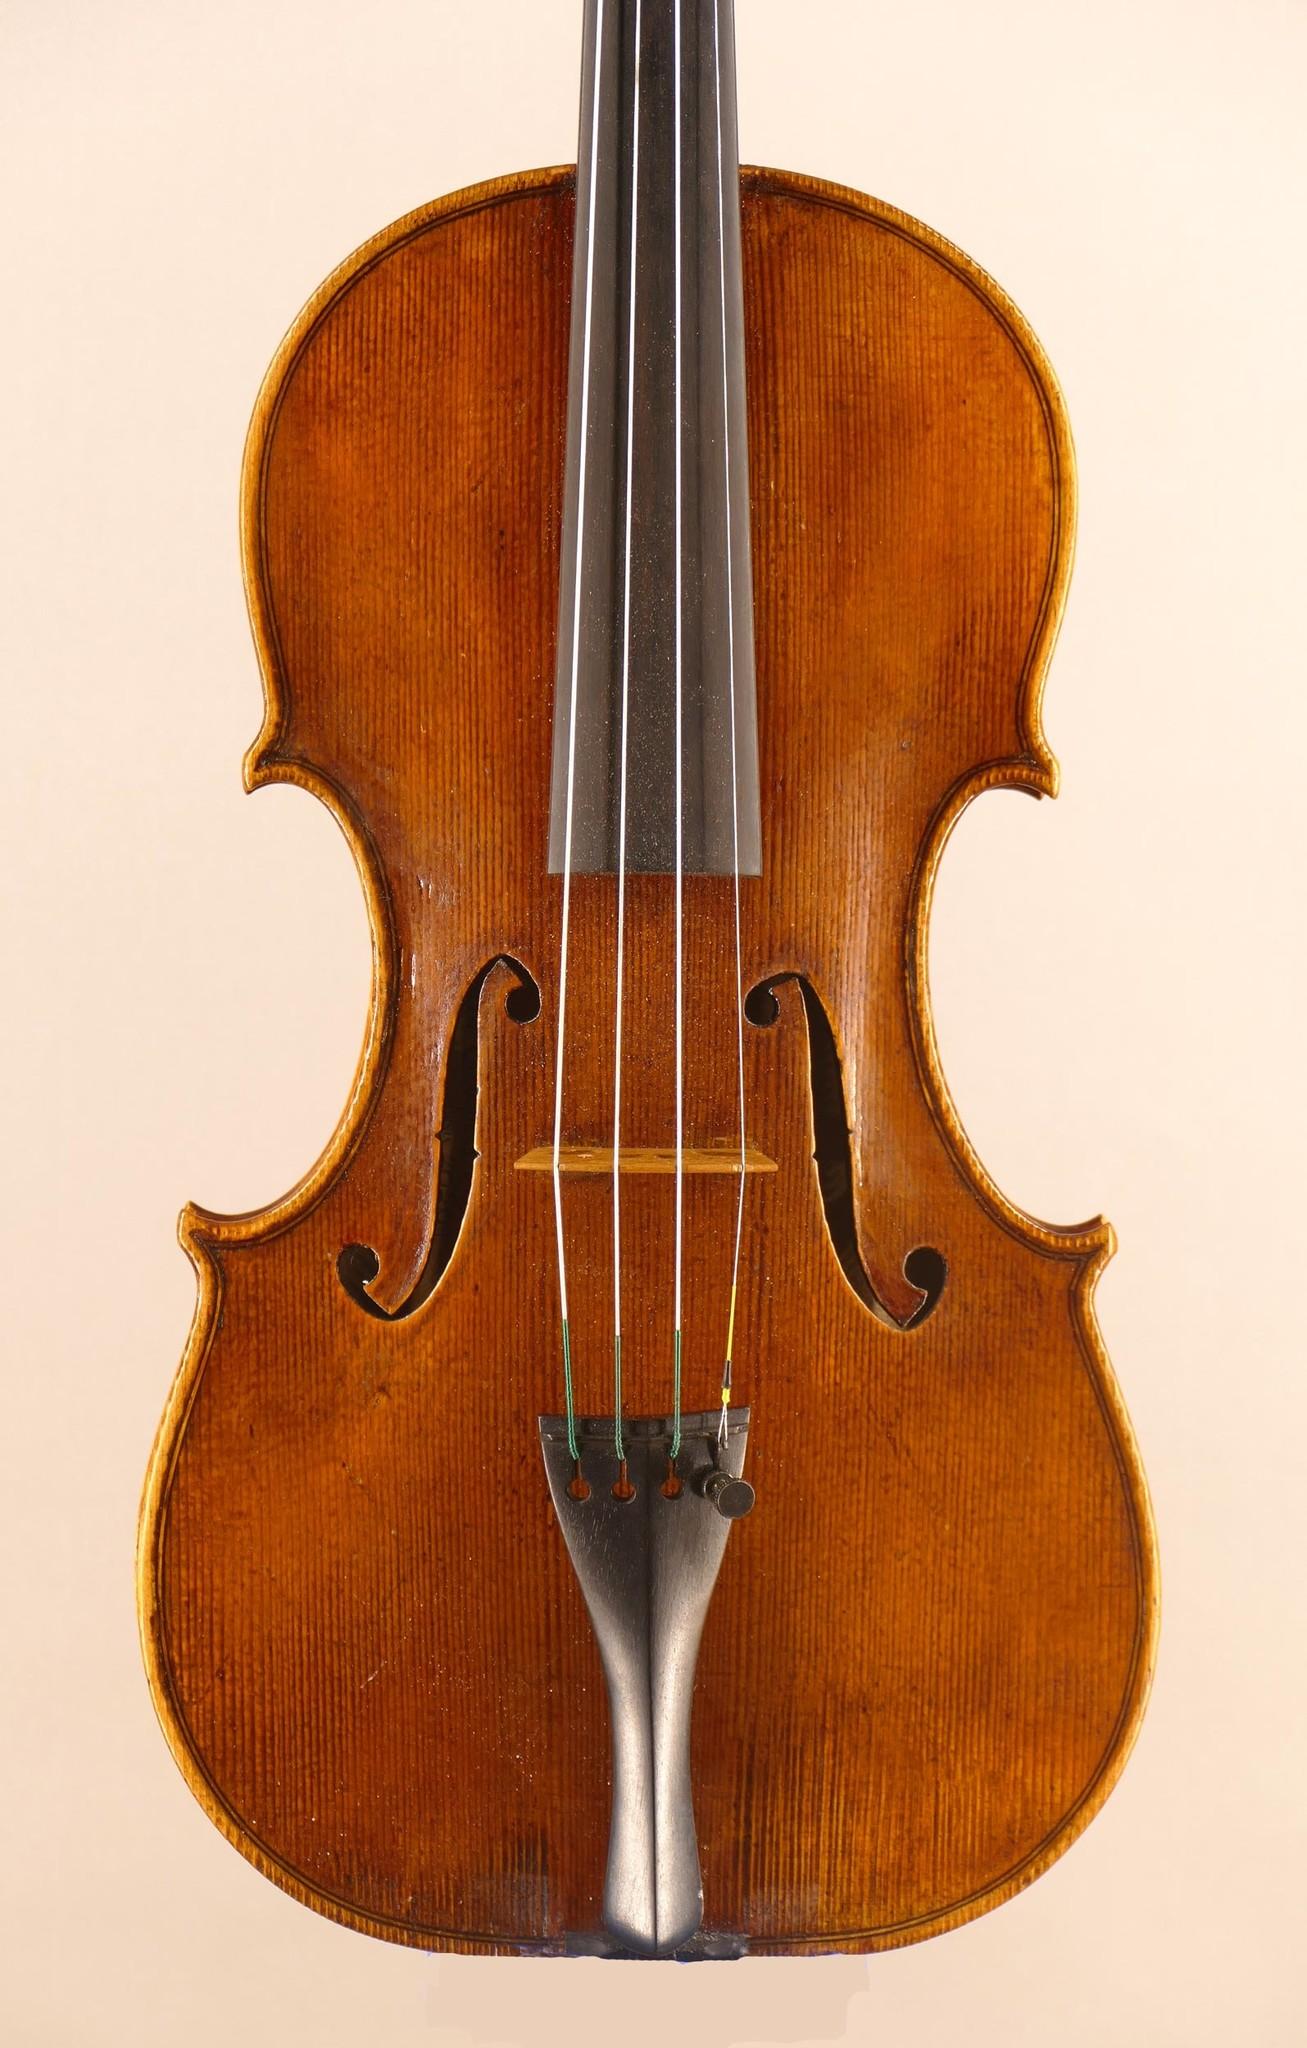 Andrew Carruthers violin, 2020, Santa Rosa, CA